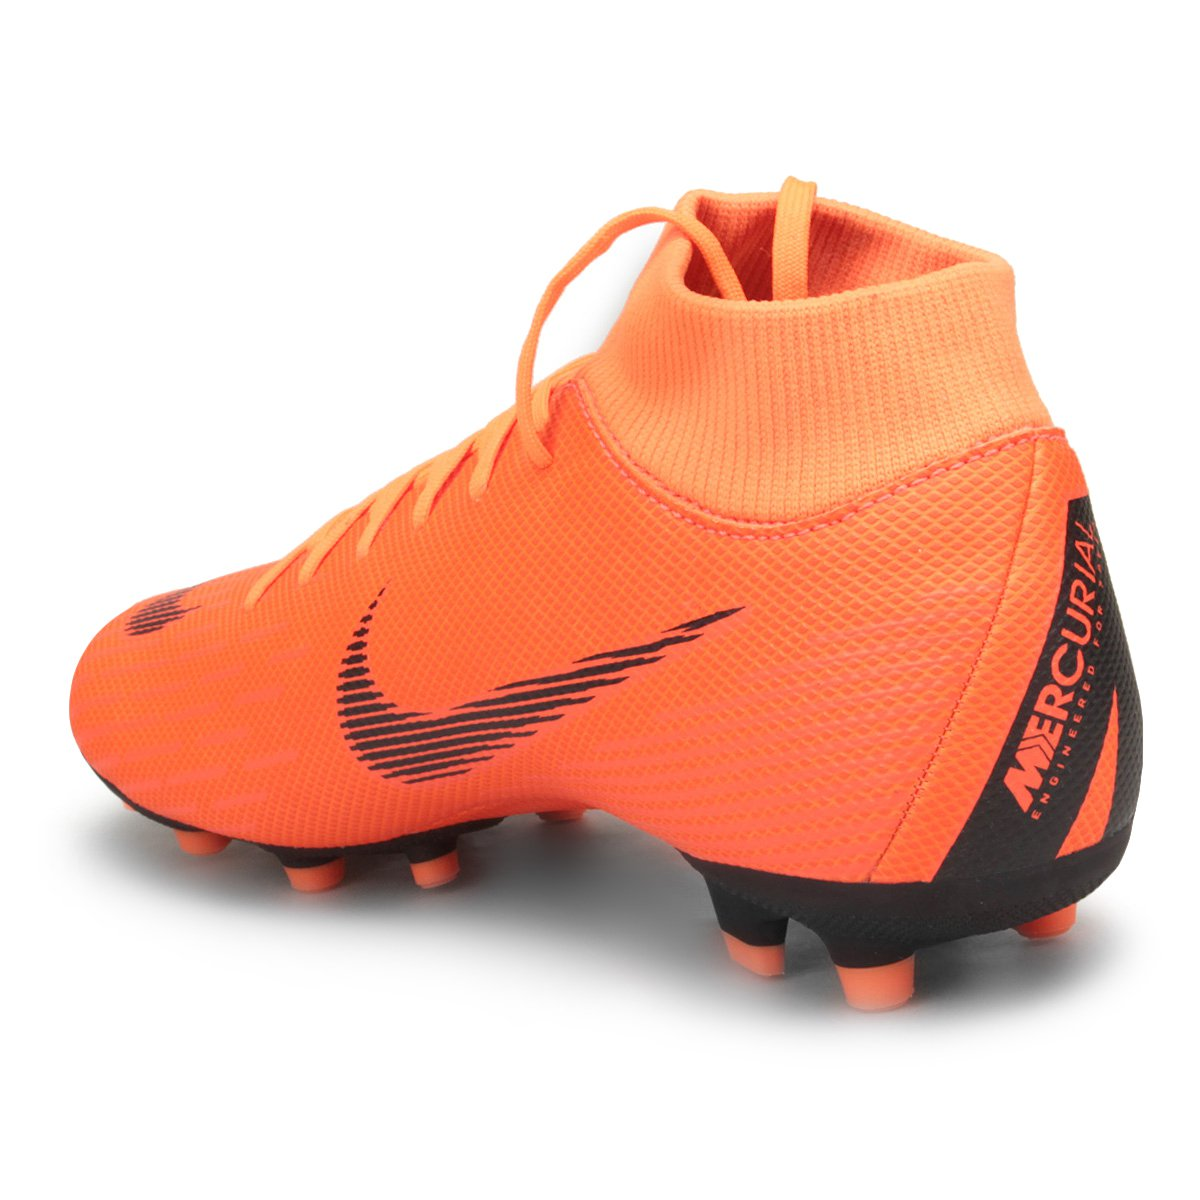 b83b87a904 Chuteira Campo Nike Mercurial Superfly 6 Academy - Laranja e Preto ...